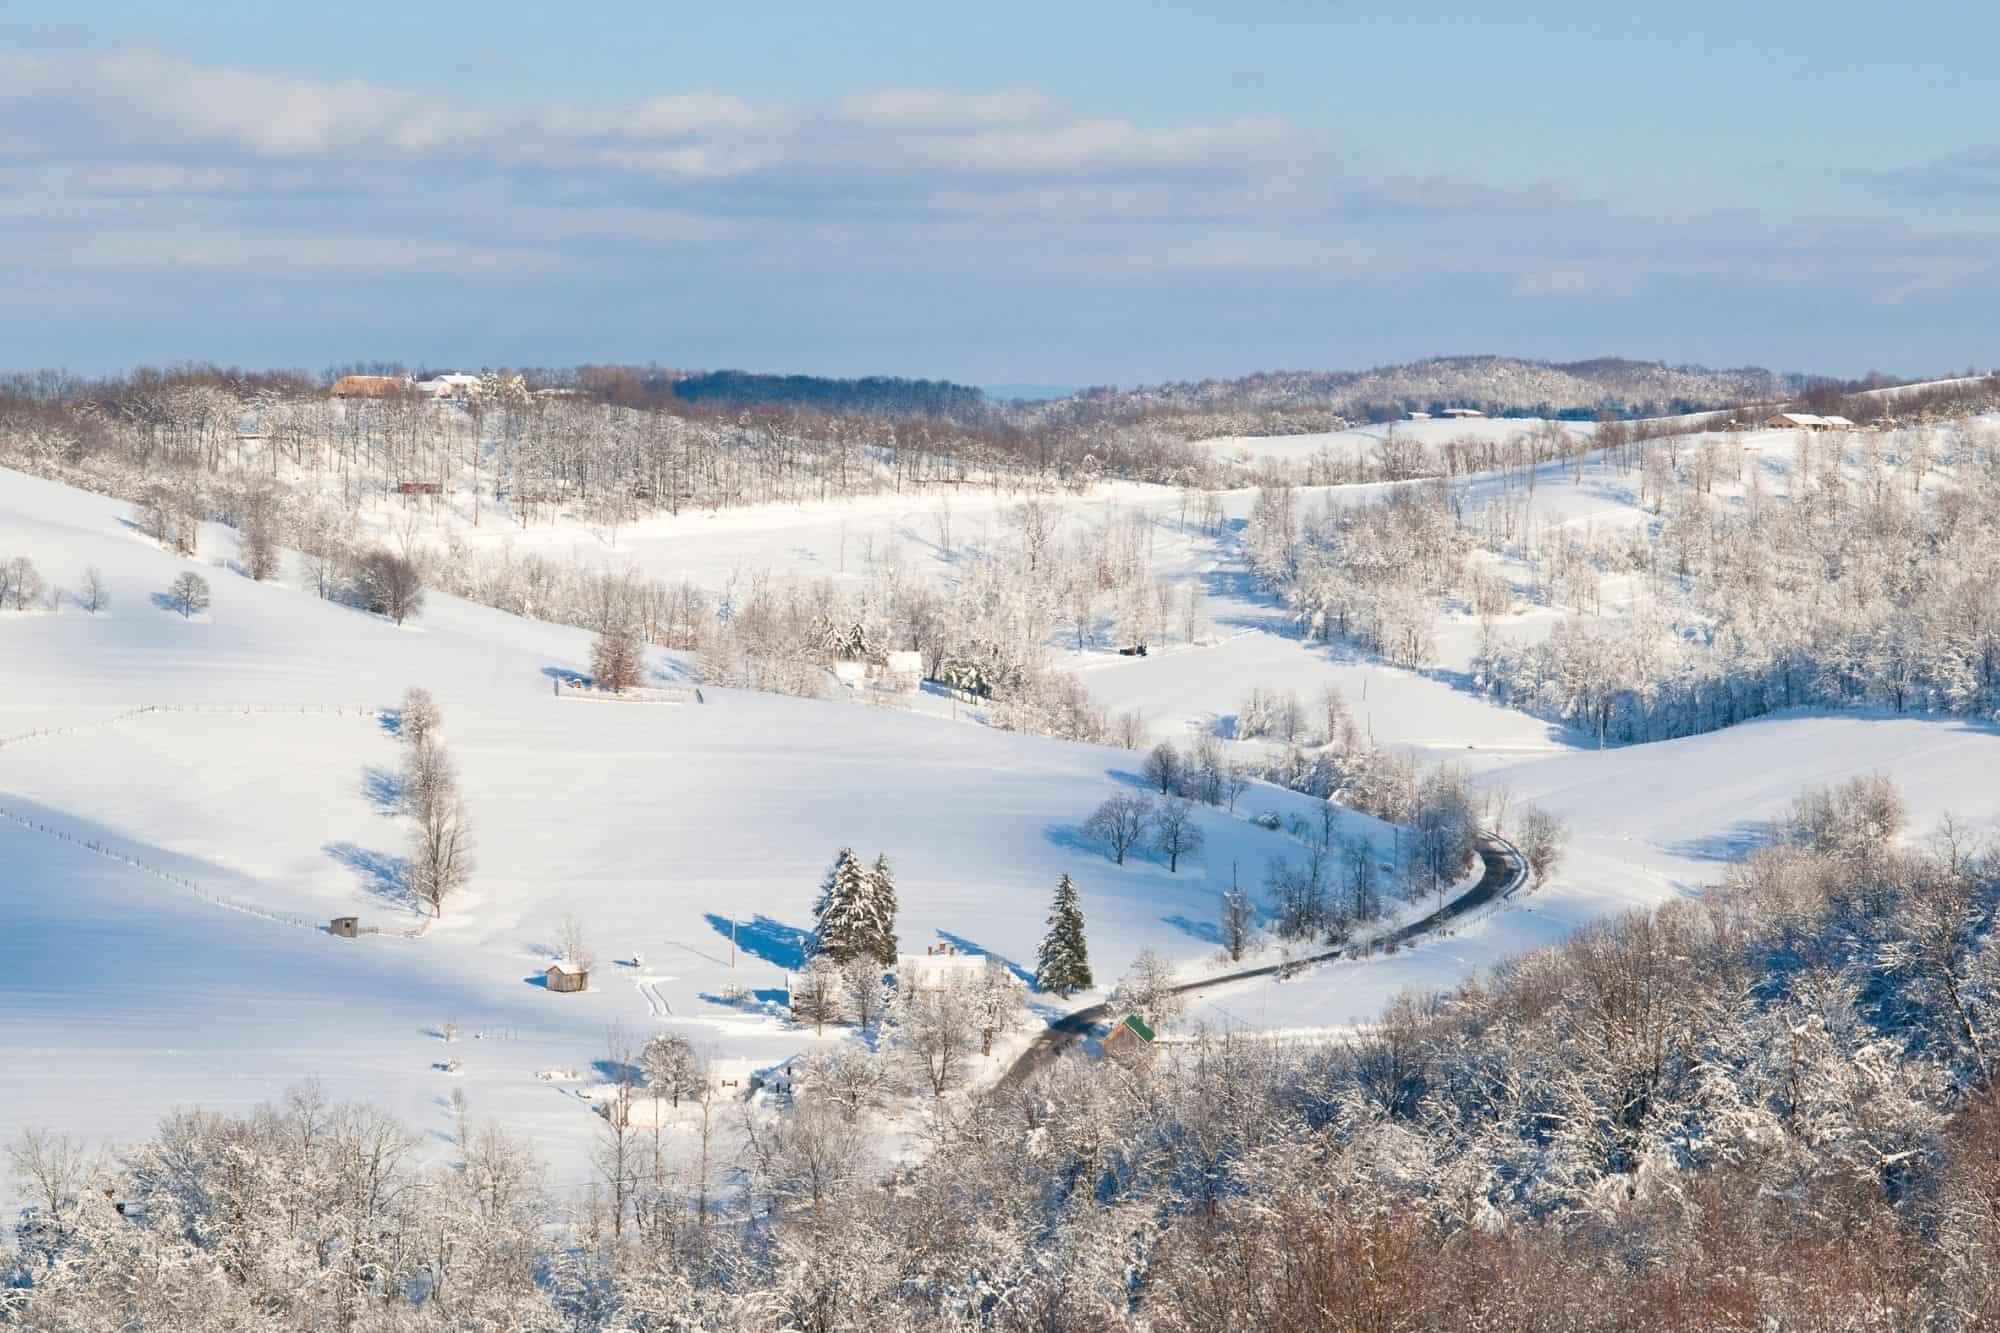 Snow on the mountains in Pennsylvania